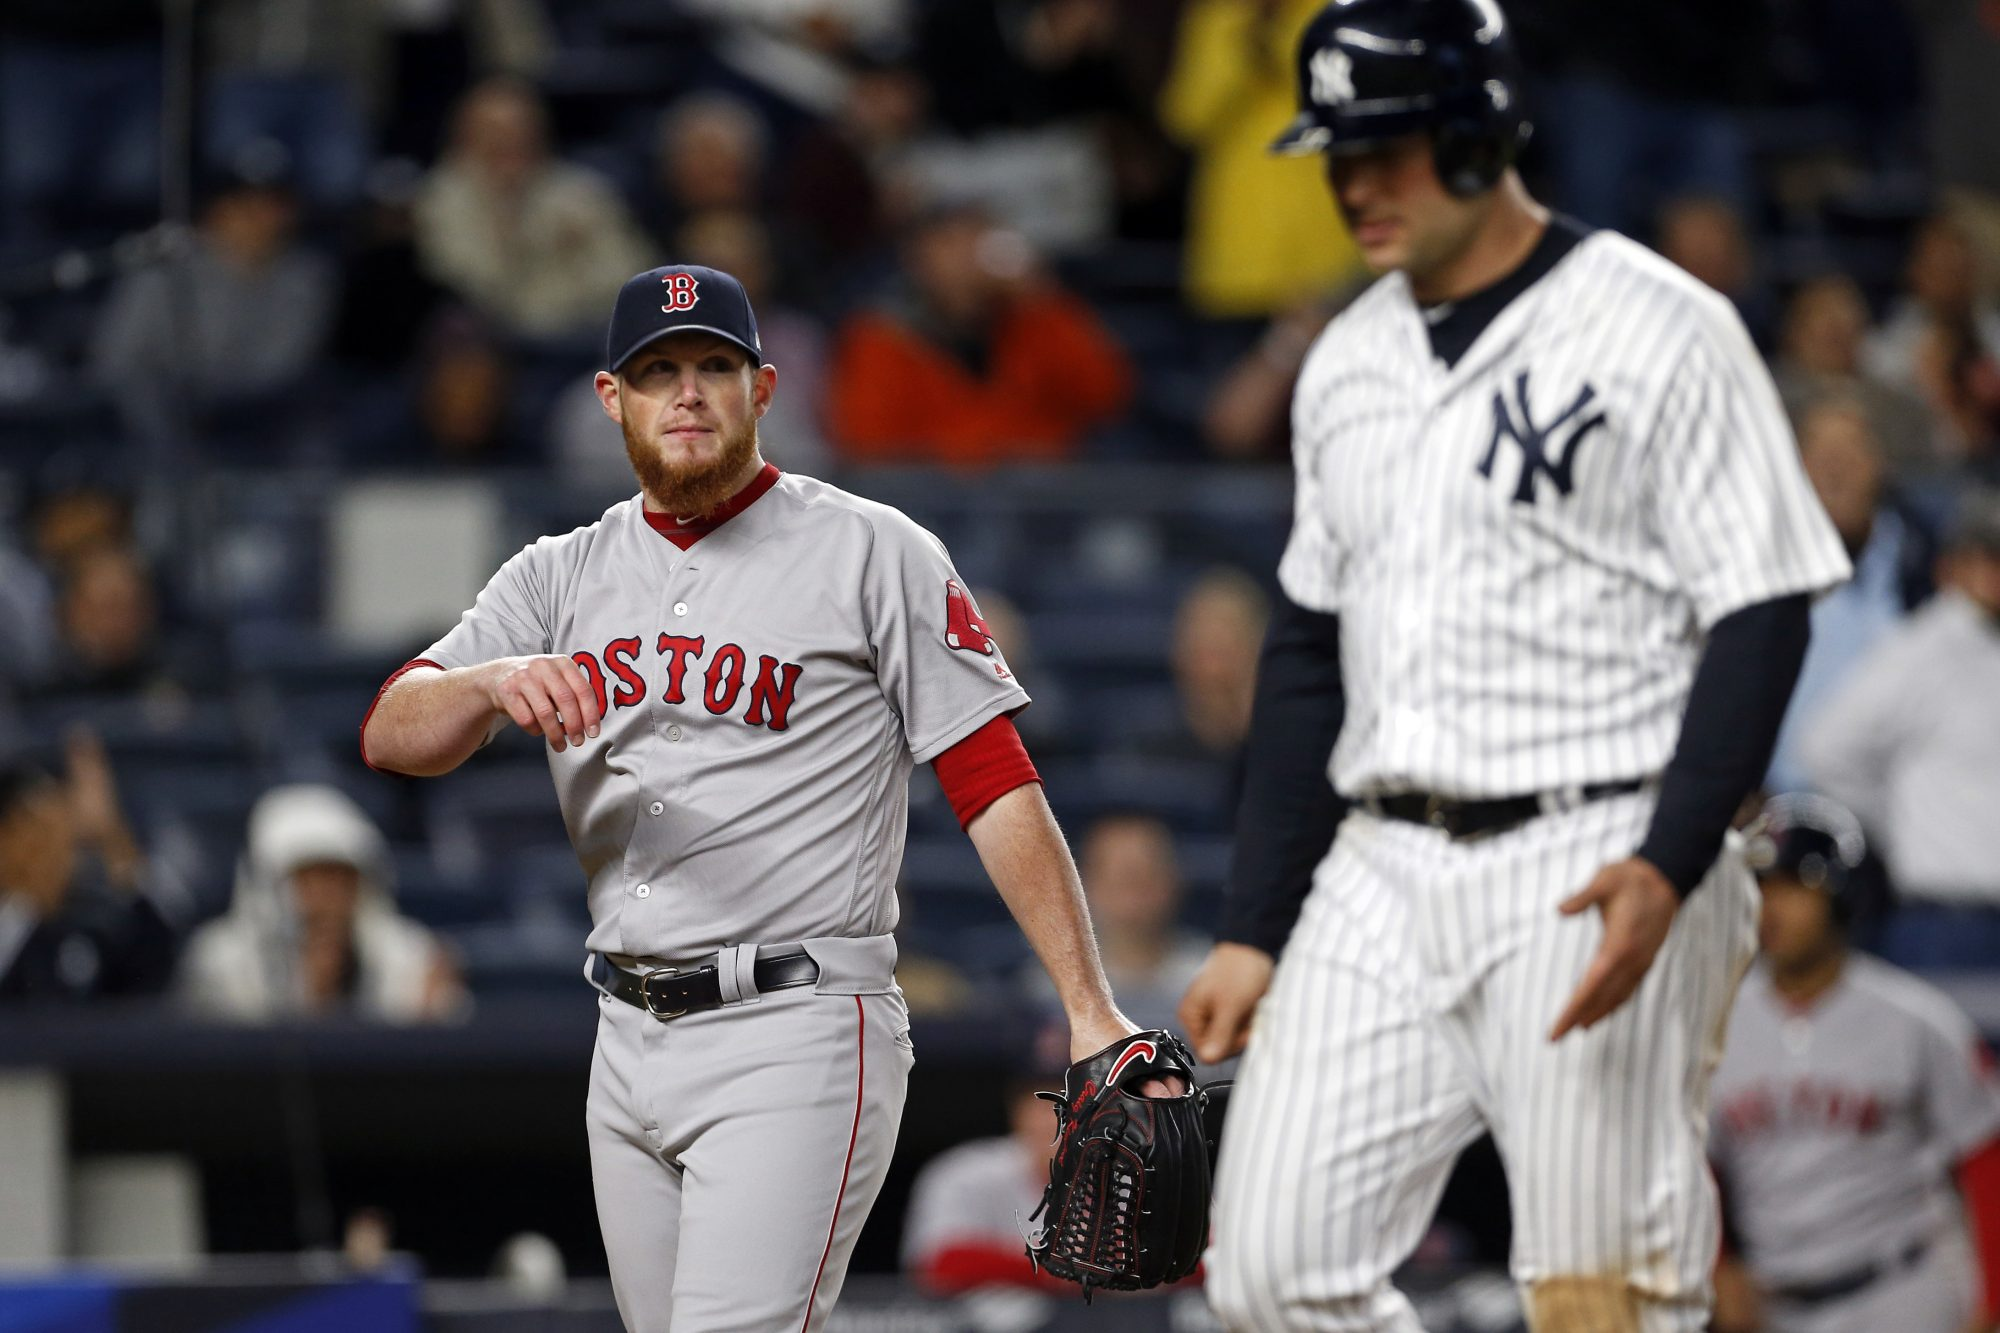 Top 4 New York Yankees-Boston Red Sox Brawls (Highlights)